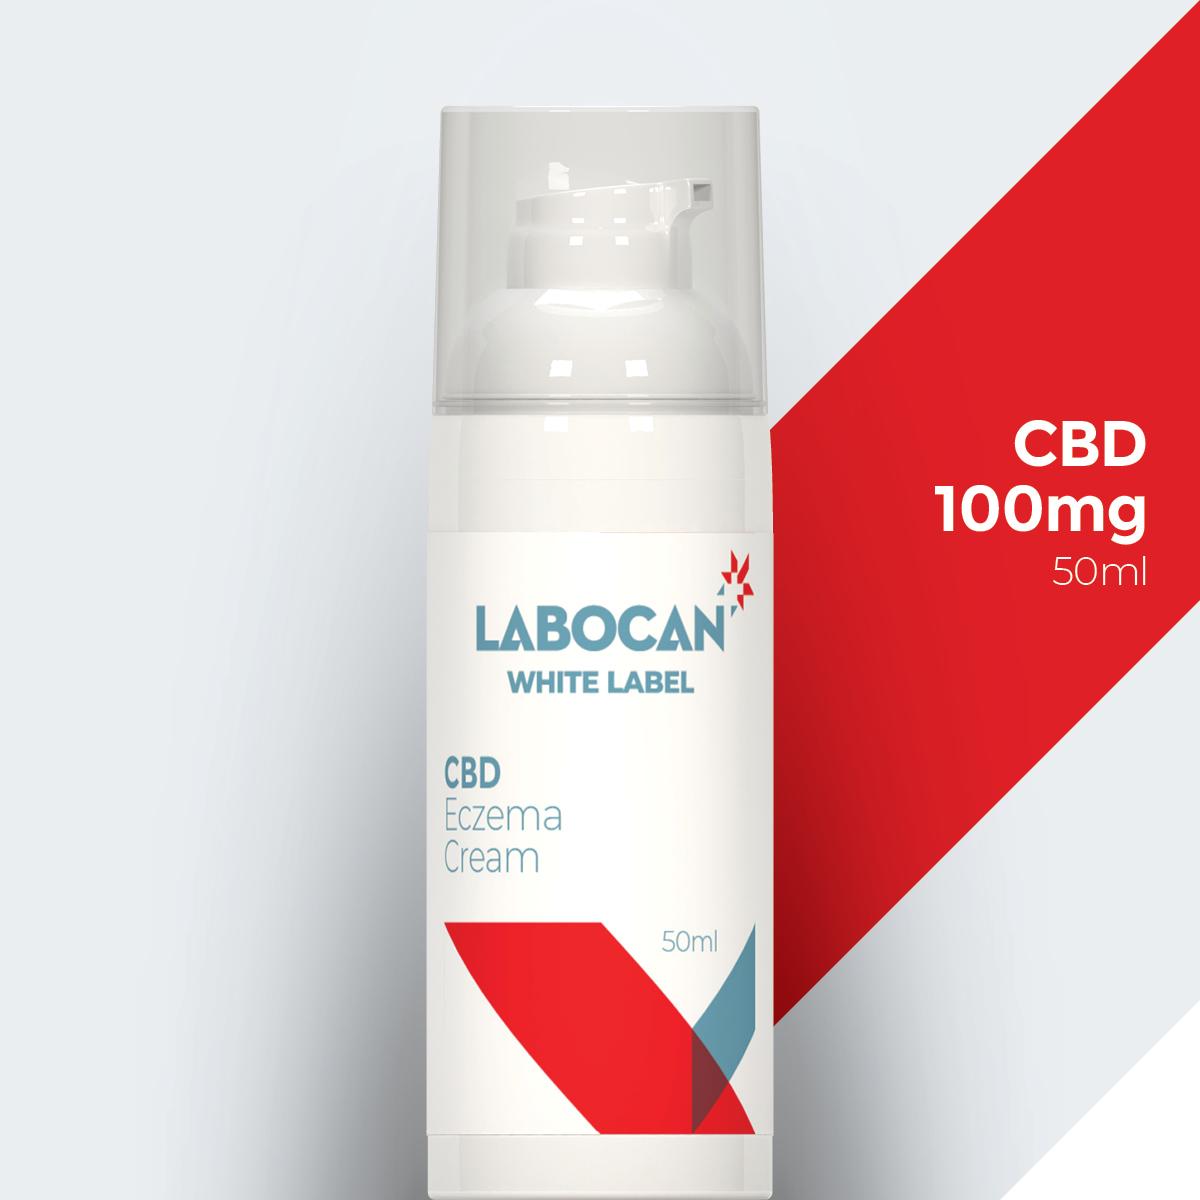 Labocan White-Label-CBD-Ekzemcreme